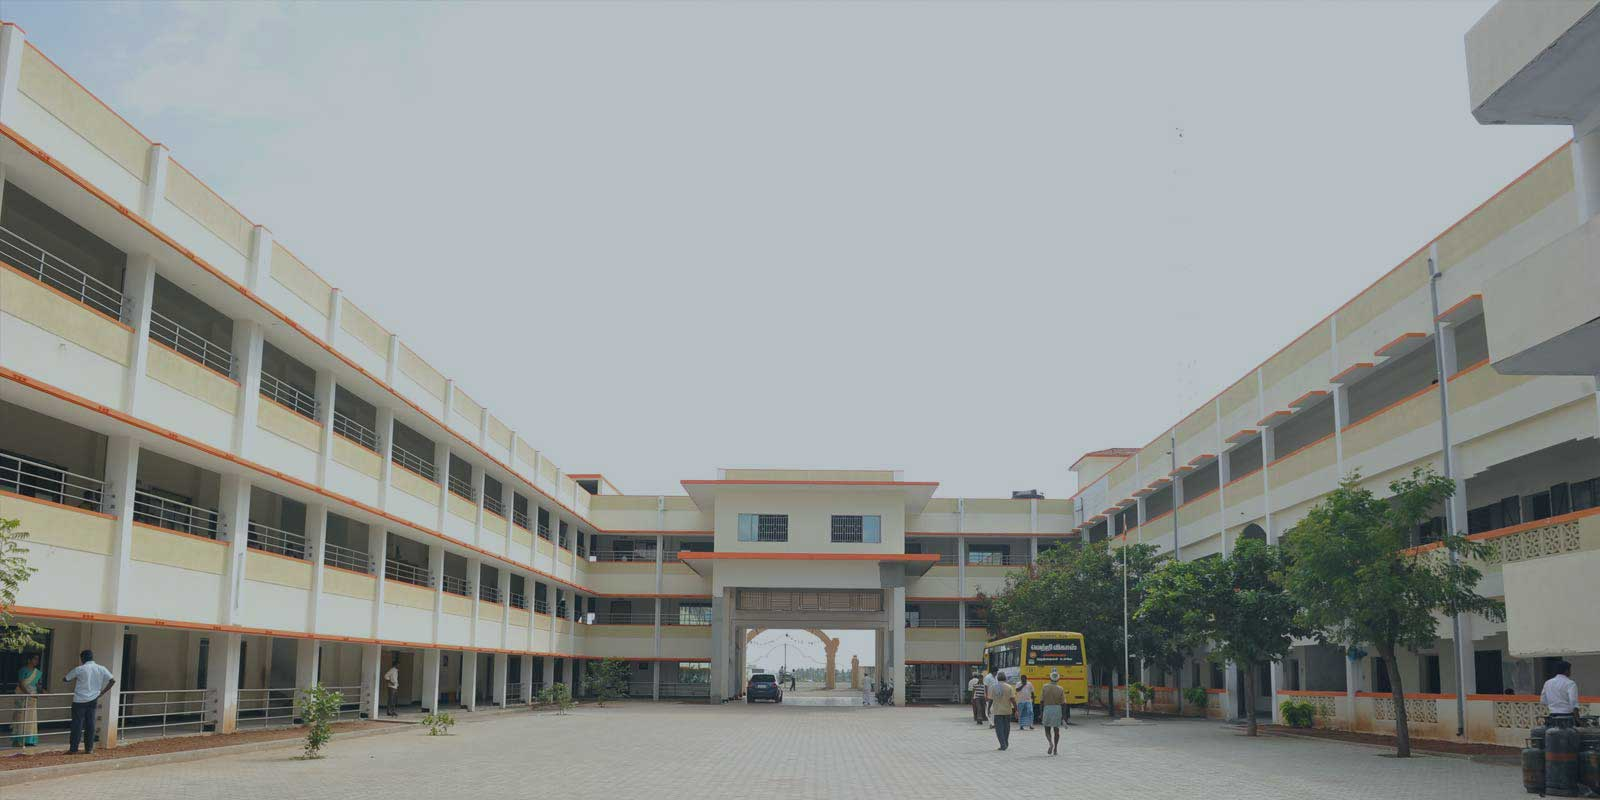 An aerial view of Vetri Vikaas campus and school buildings